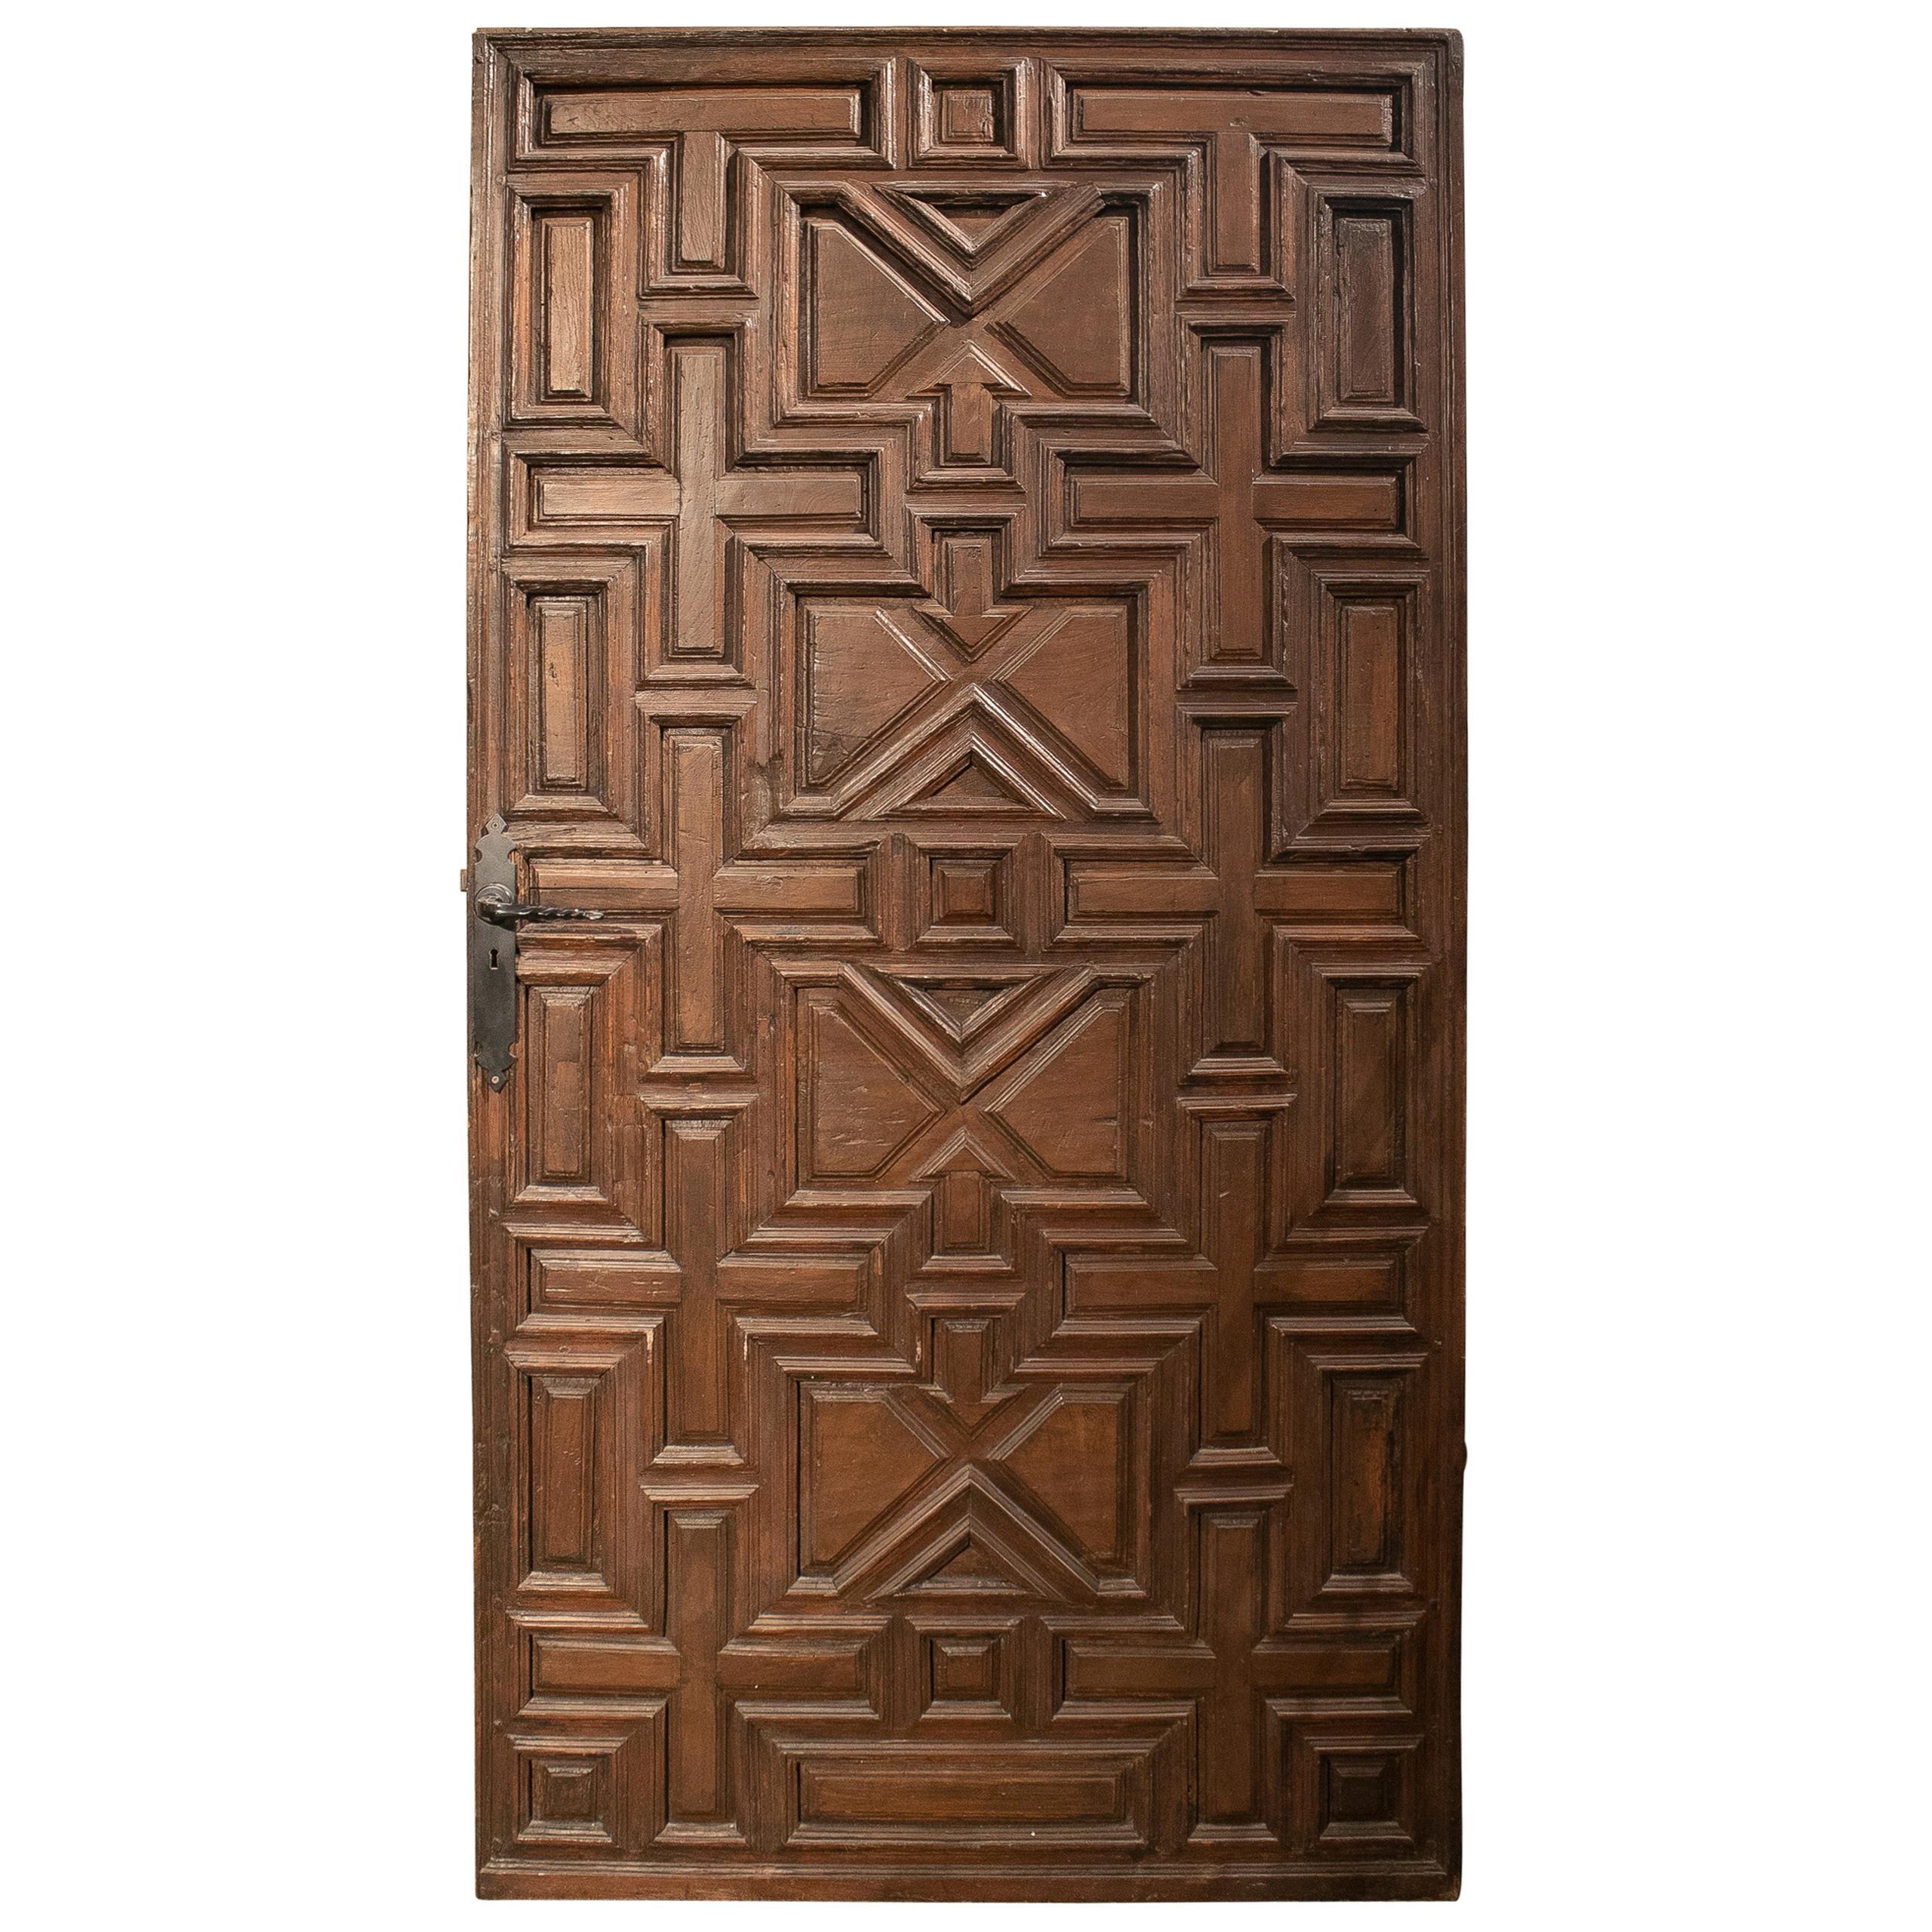 18th Century Spanish Geometric Panelled Wooden Main Door